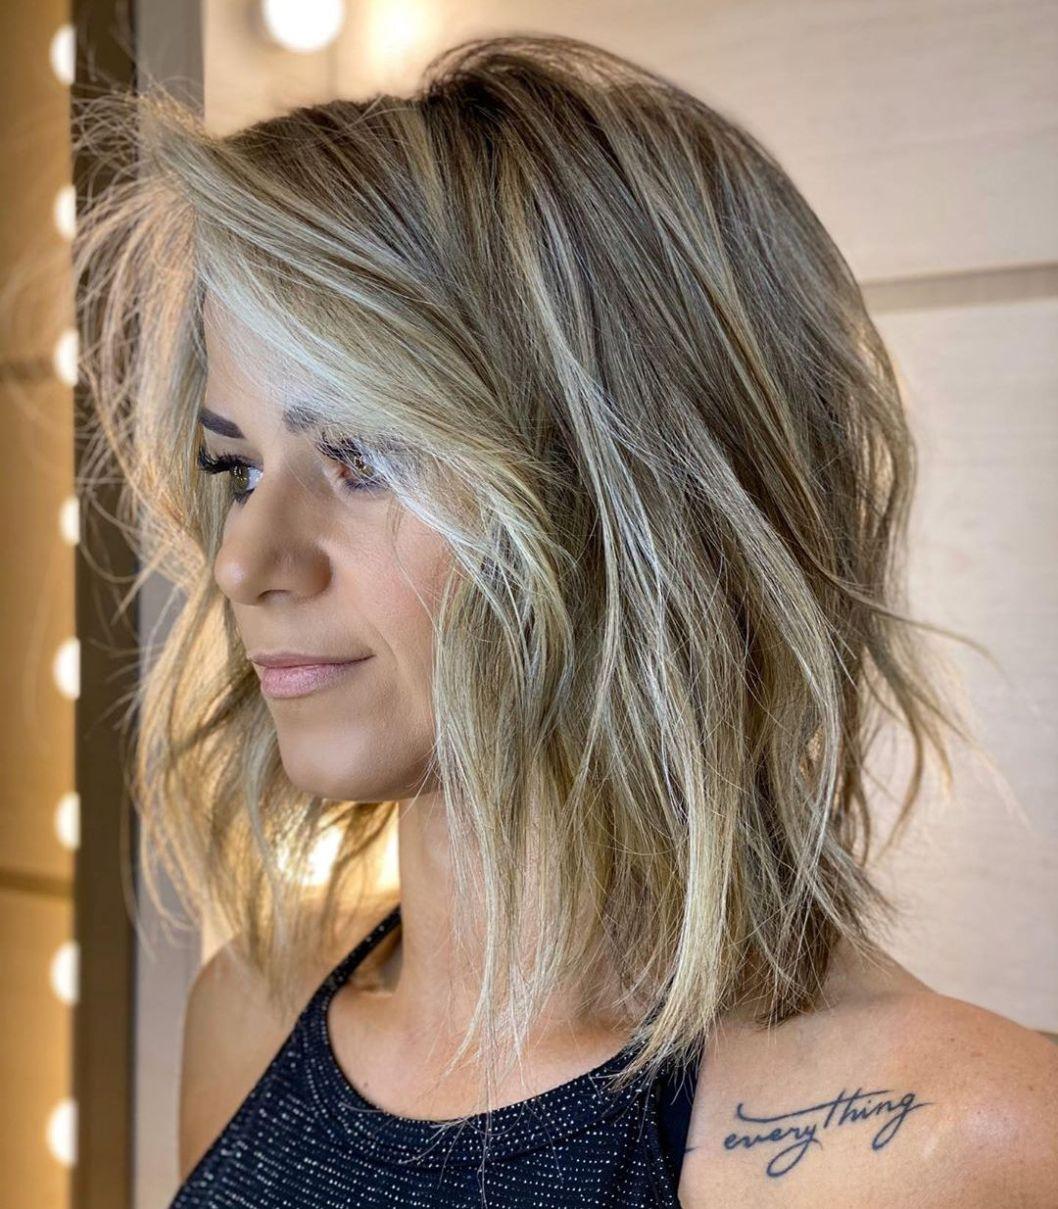 11 Newest Haircut Ideas and Haircut Trends for 11 - Hair Adviser